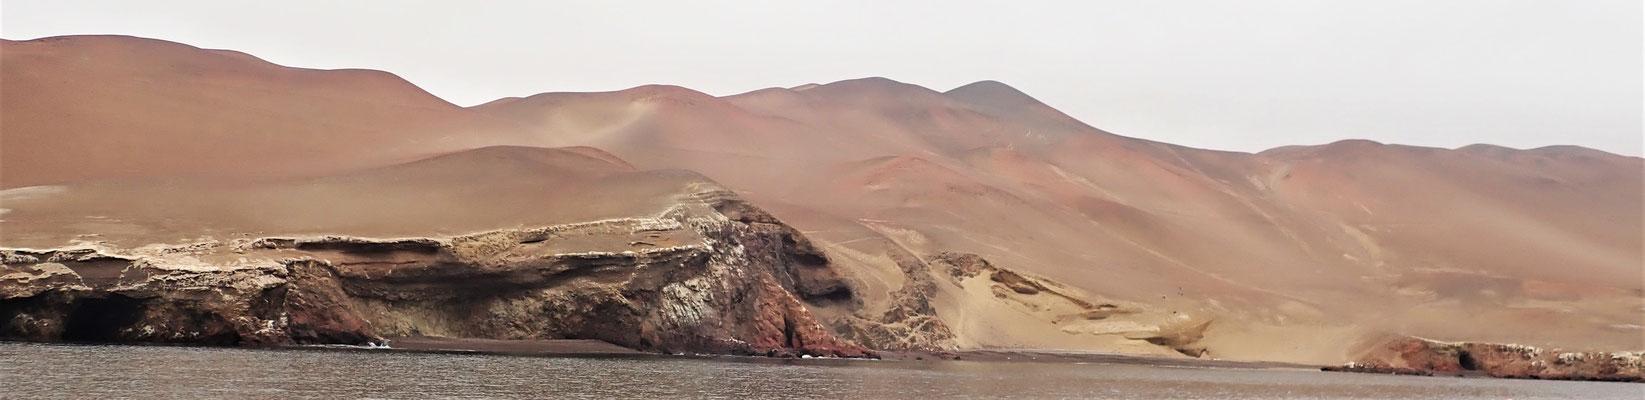 .....zu den Ballestas Inseln....